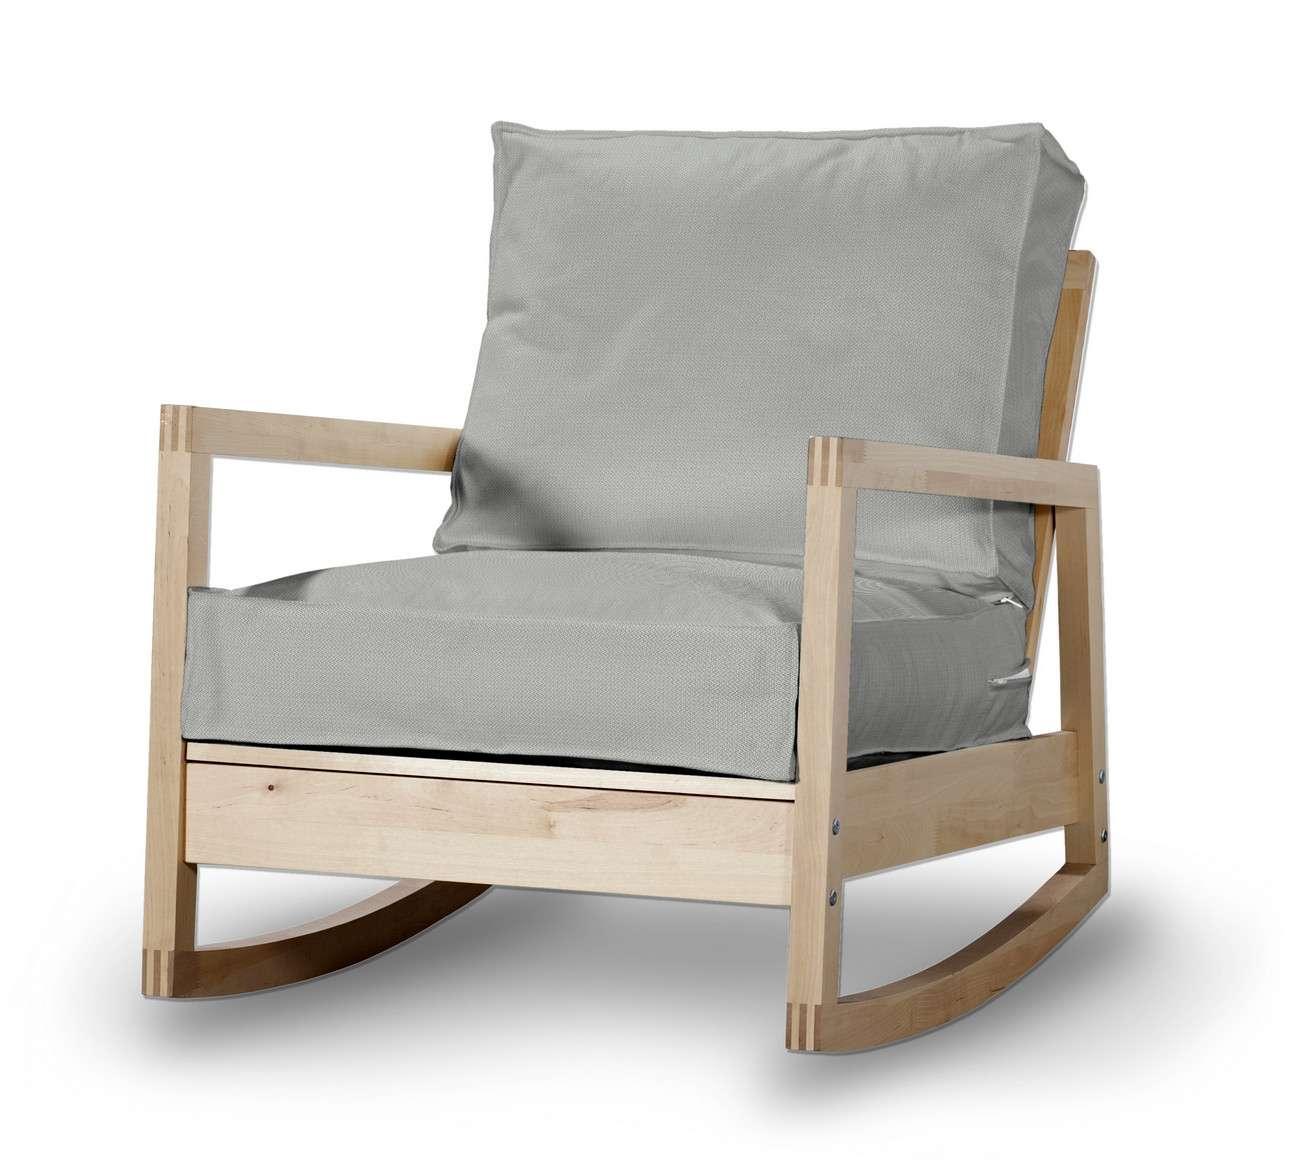 Pokrowiec na fotel Lillberg w kolekcji Bergen, tkanina: 161-72